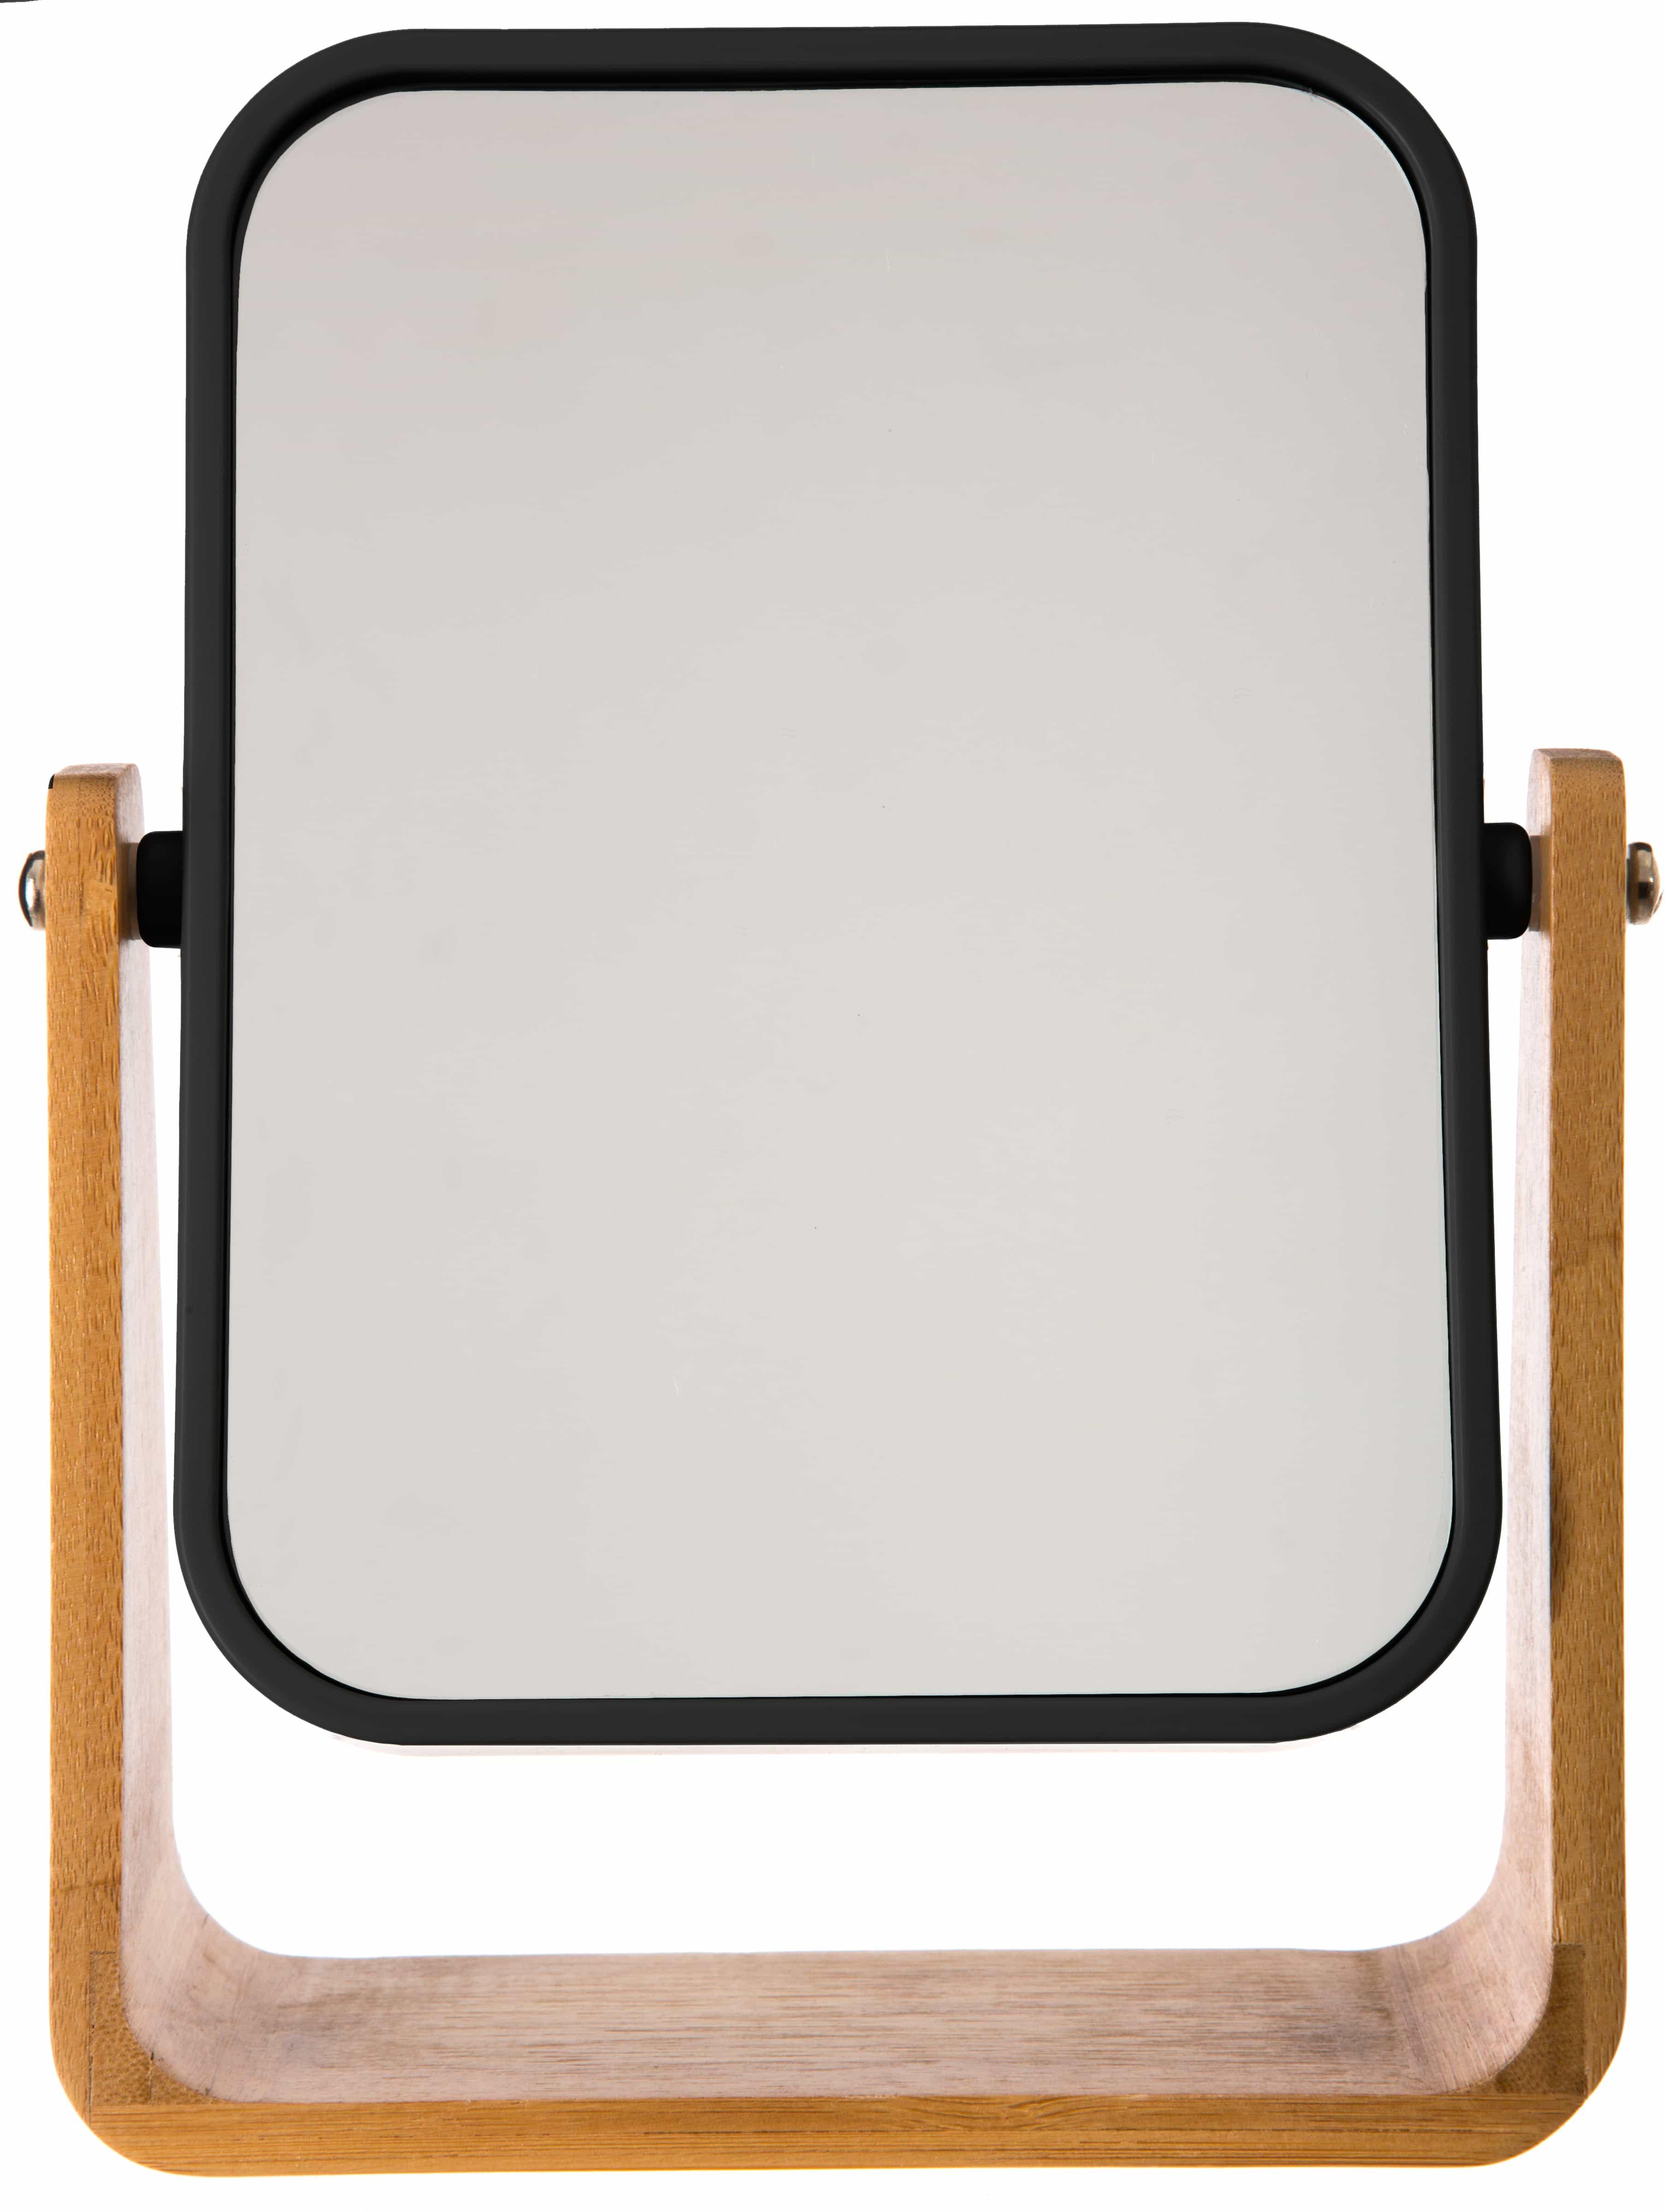 4goodz make-up spiegeltje bamboe 16x22x6 cm Vergroot 3x - Zwart/bruin